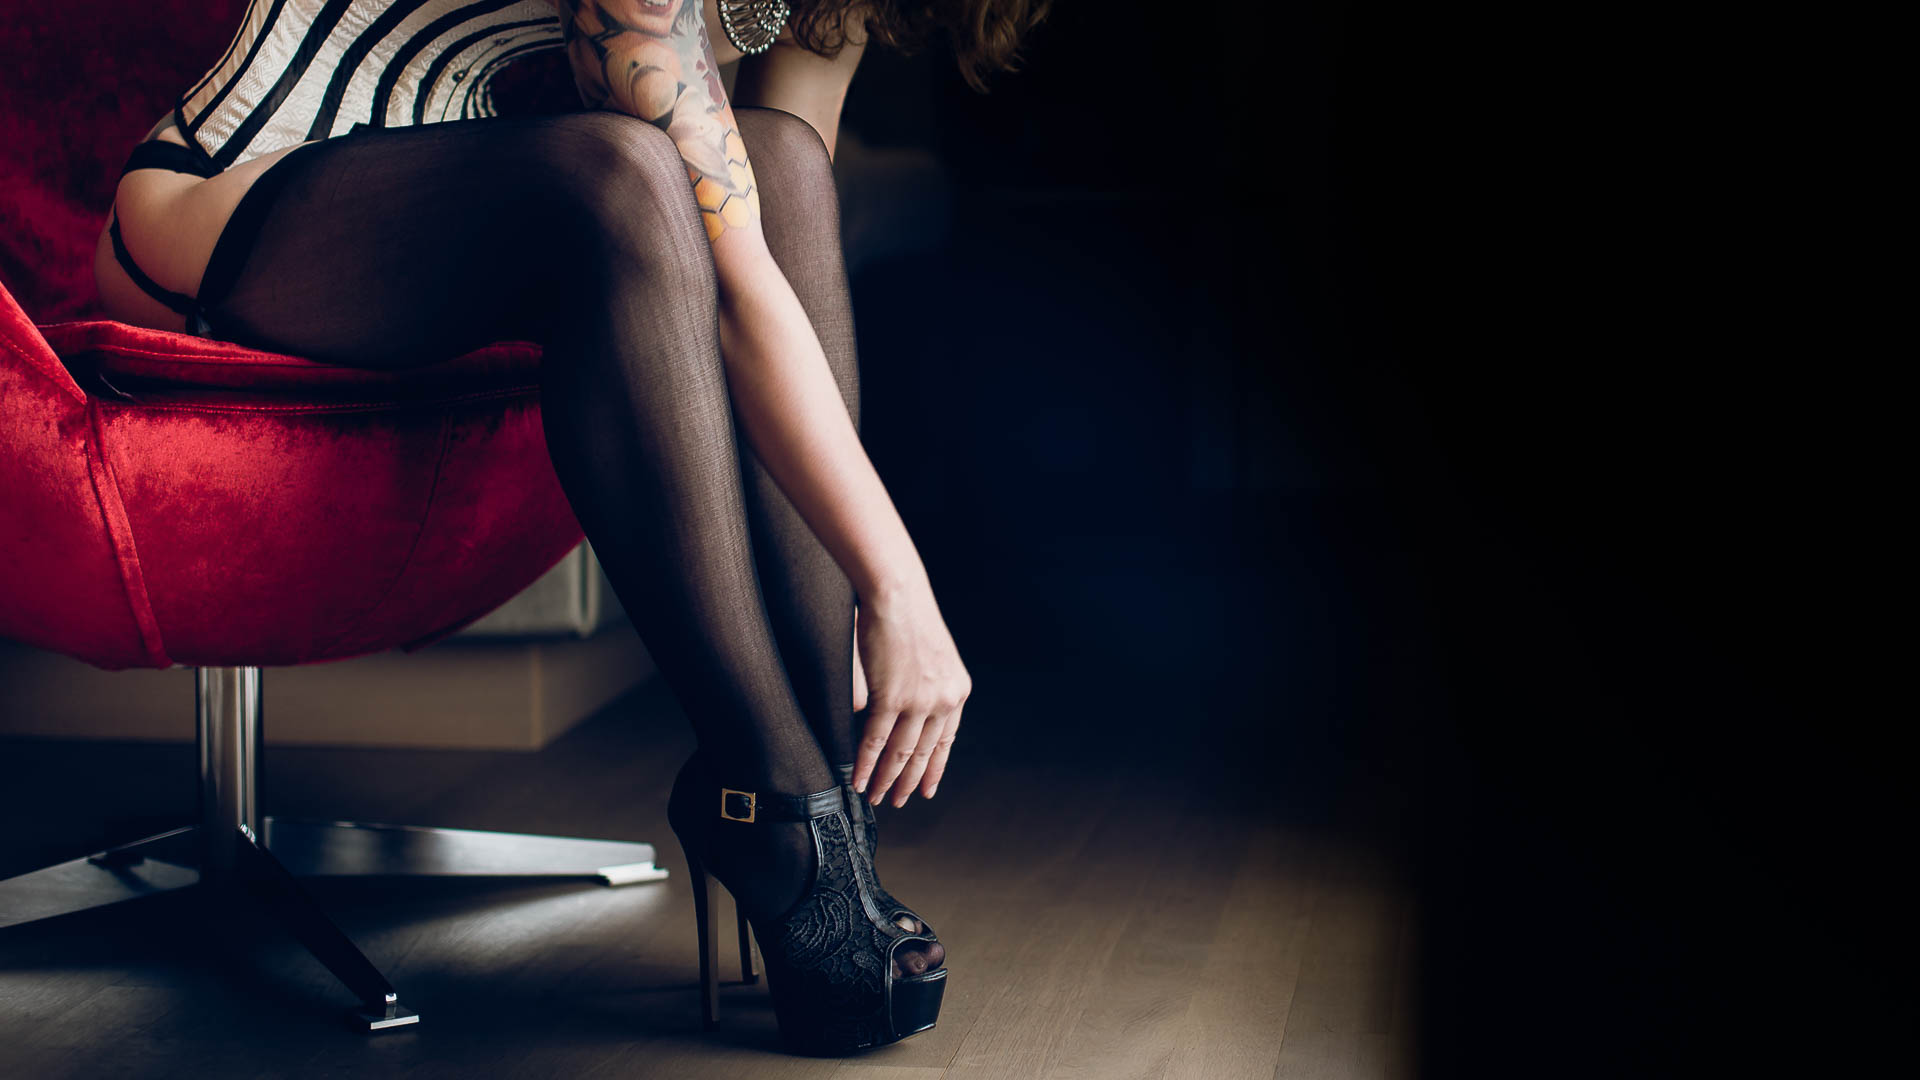 markus-schneeberger-boudoir-photography-001